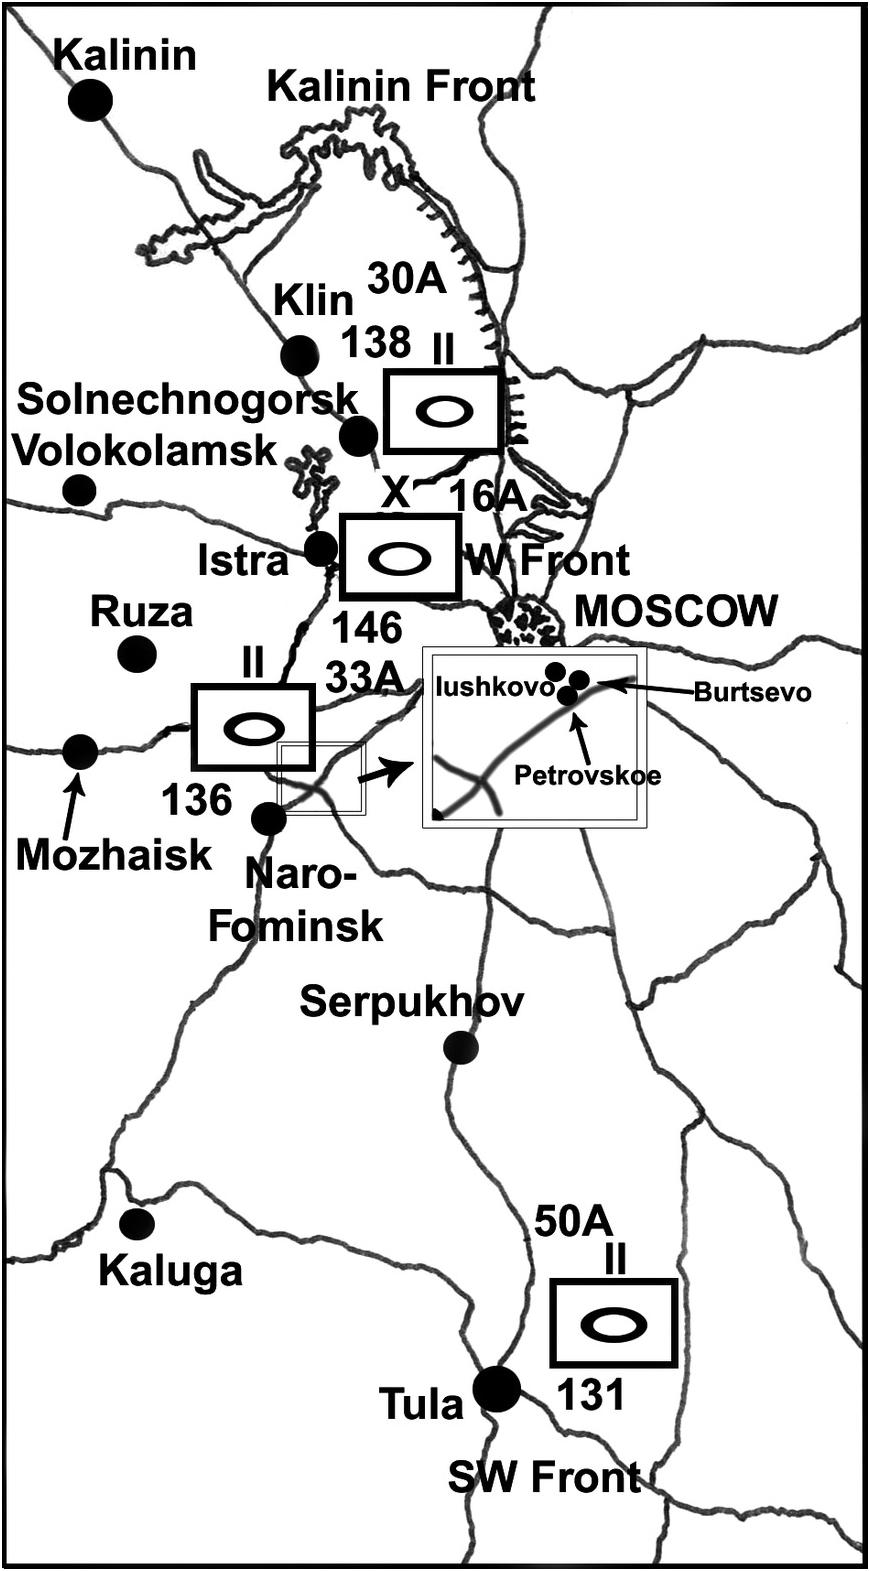 tratament comun în serpukhov)